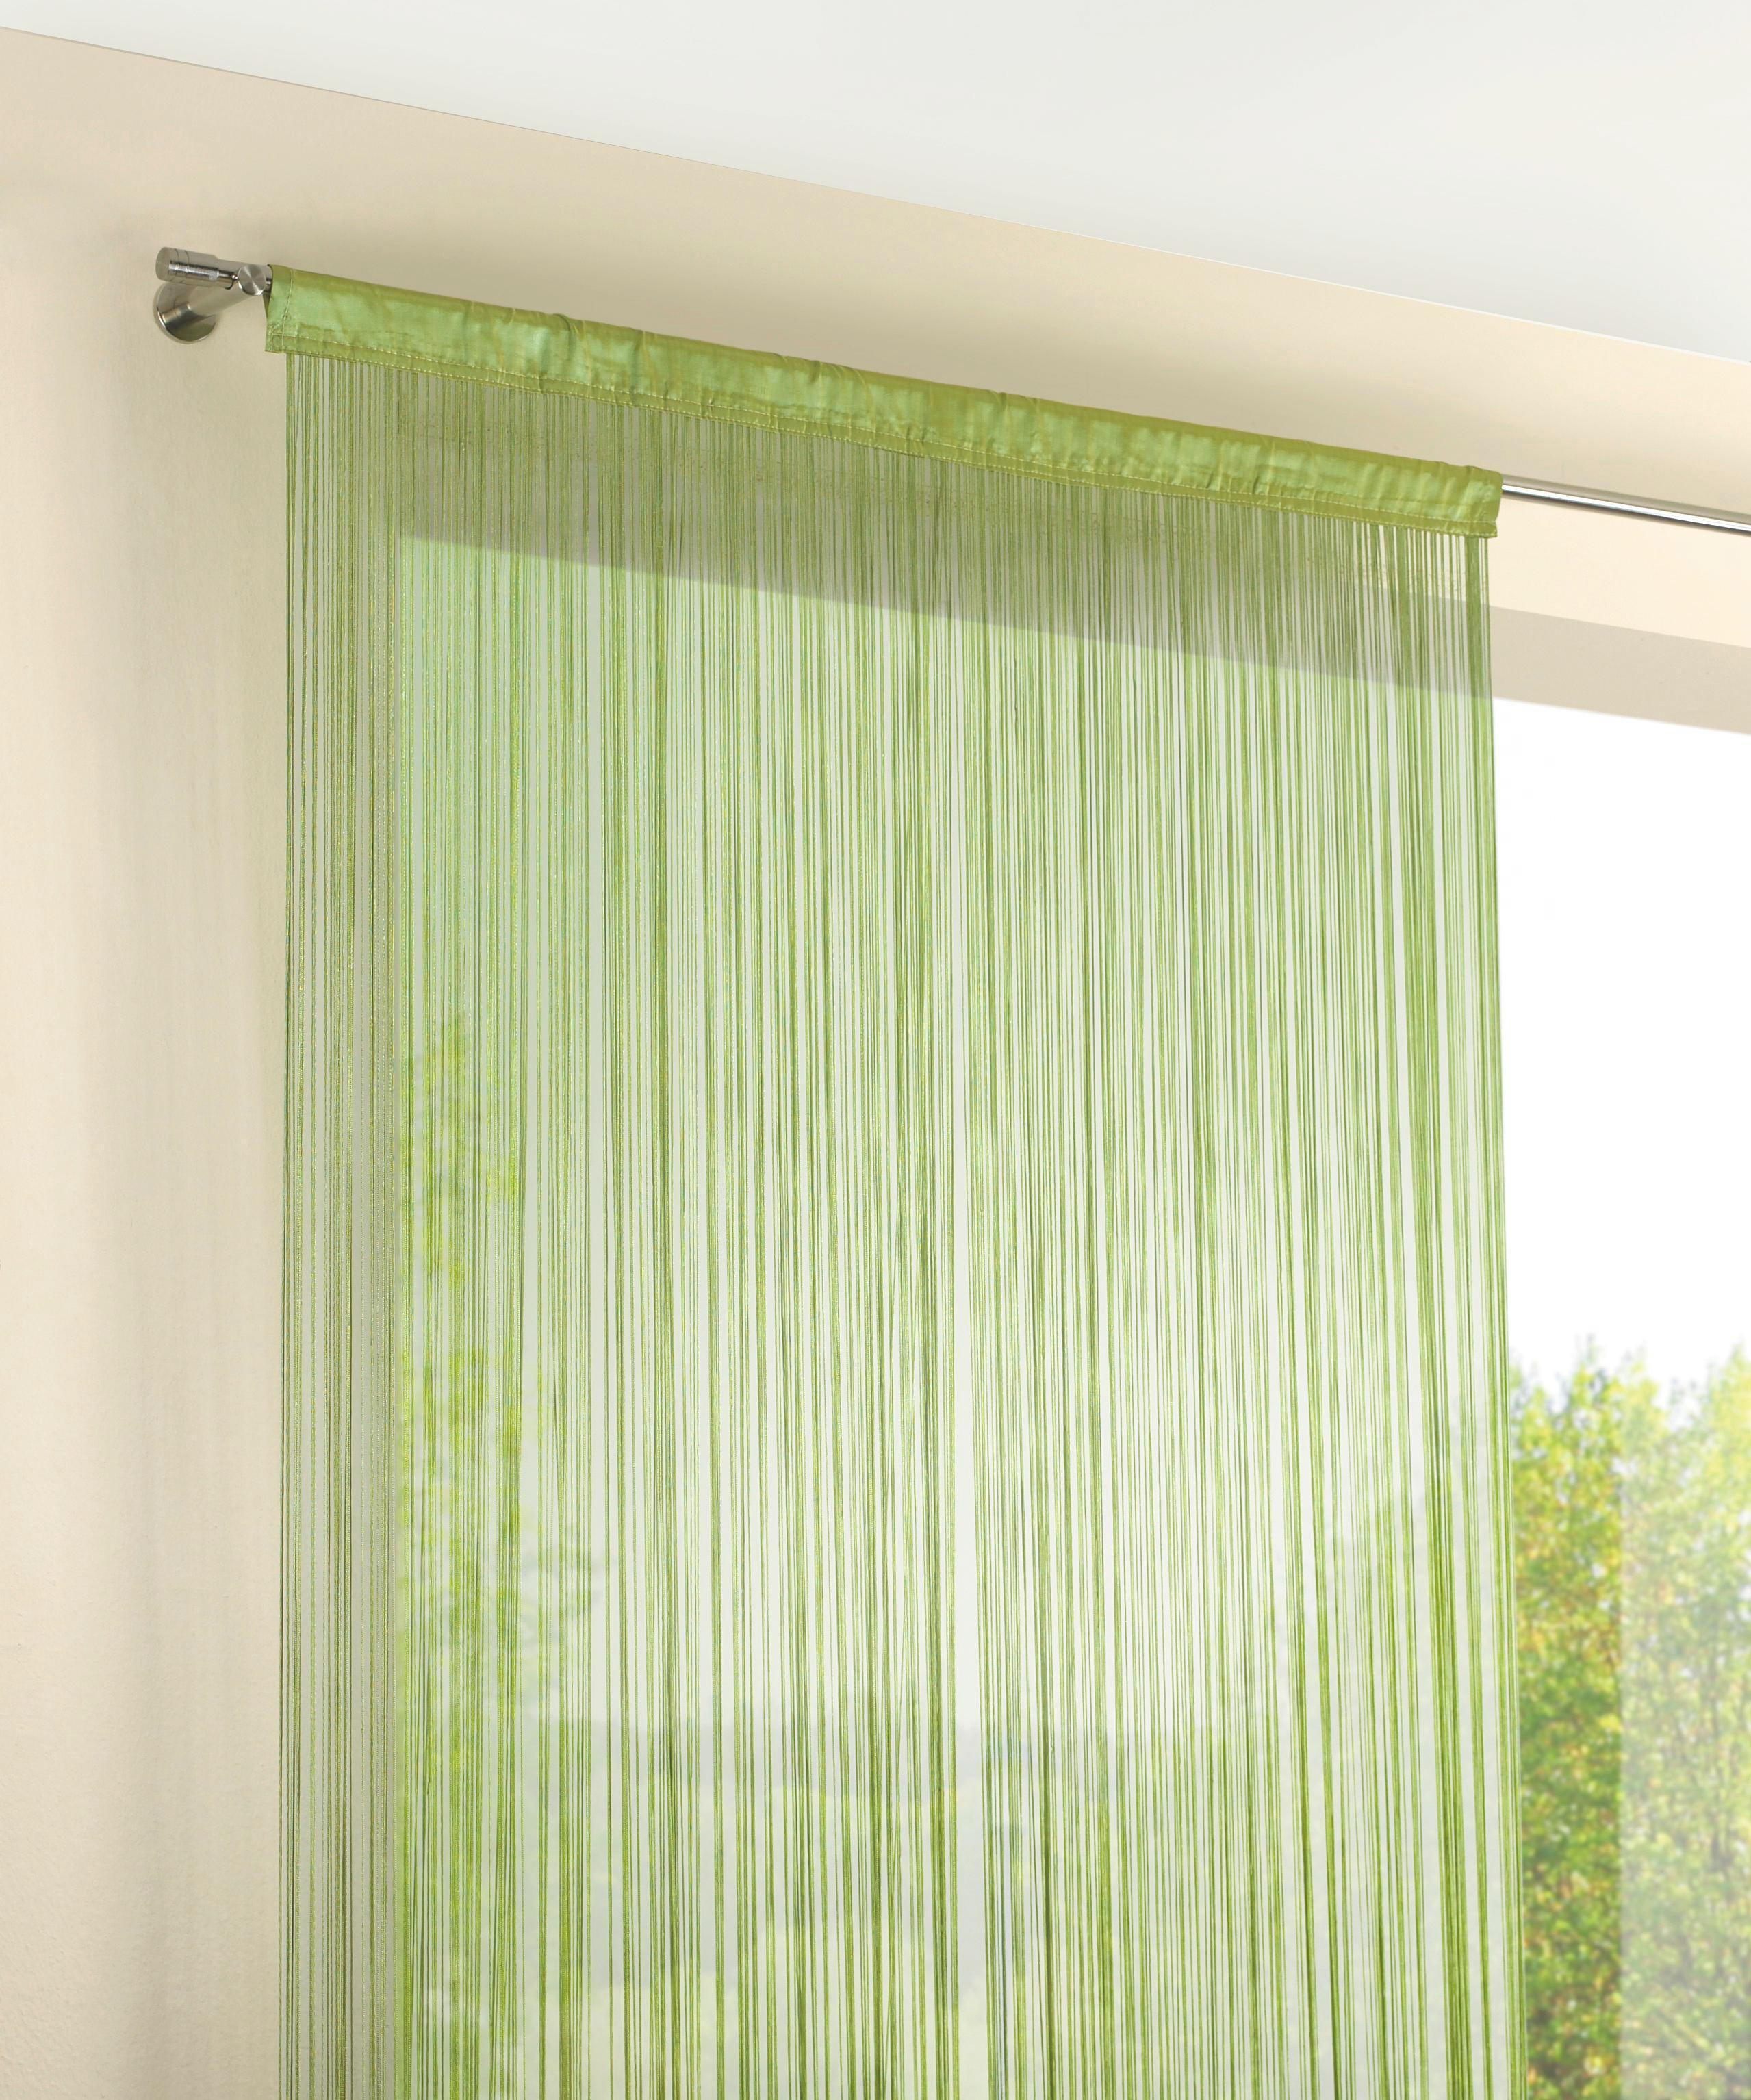 TRÅDGARDIN - grön, Klassisk, textil (90/245cm) - BOXXX